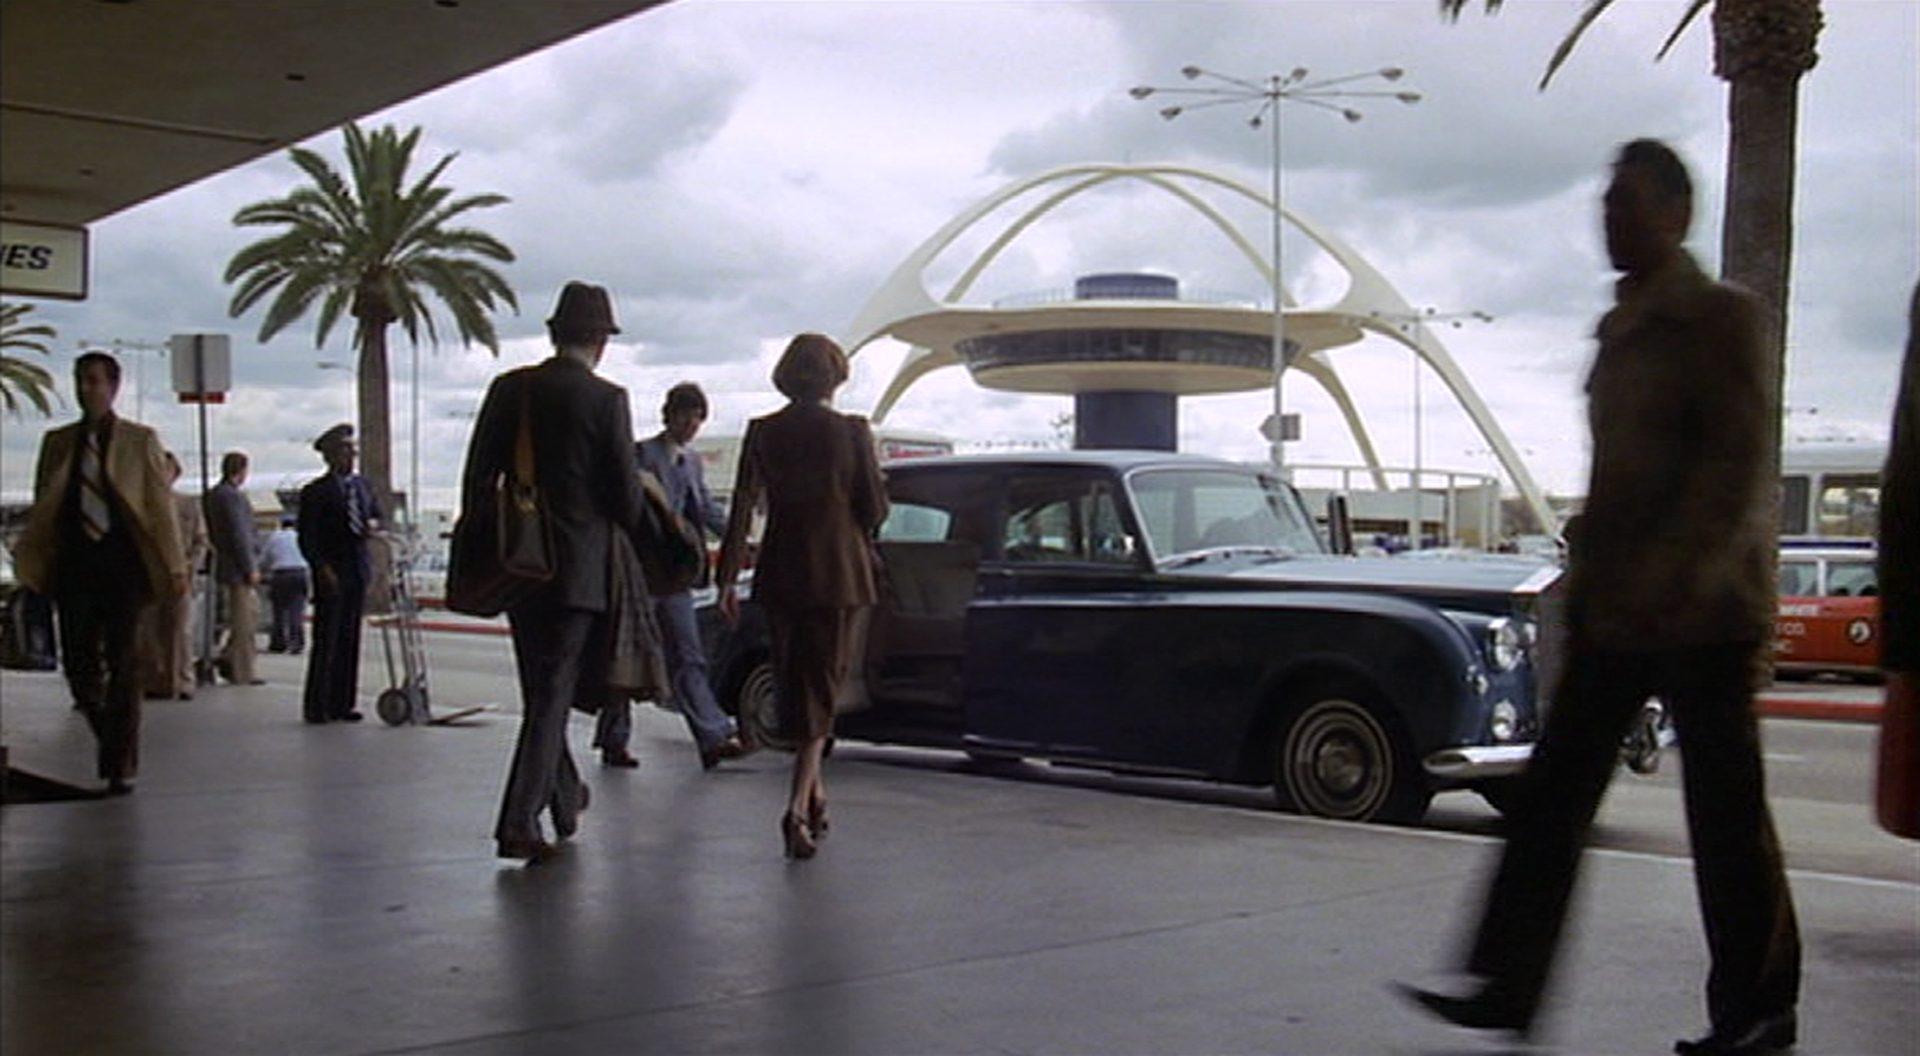 Szene aus 'Das verrückte California-Hotel(1978)'